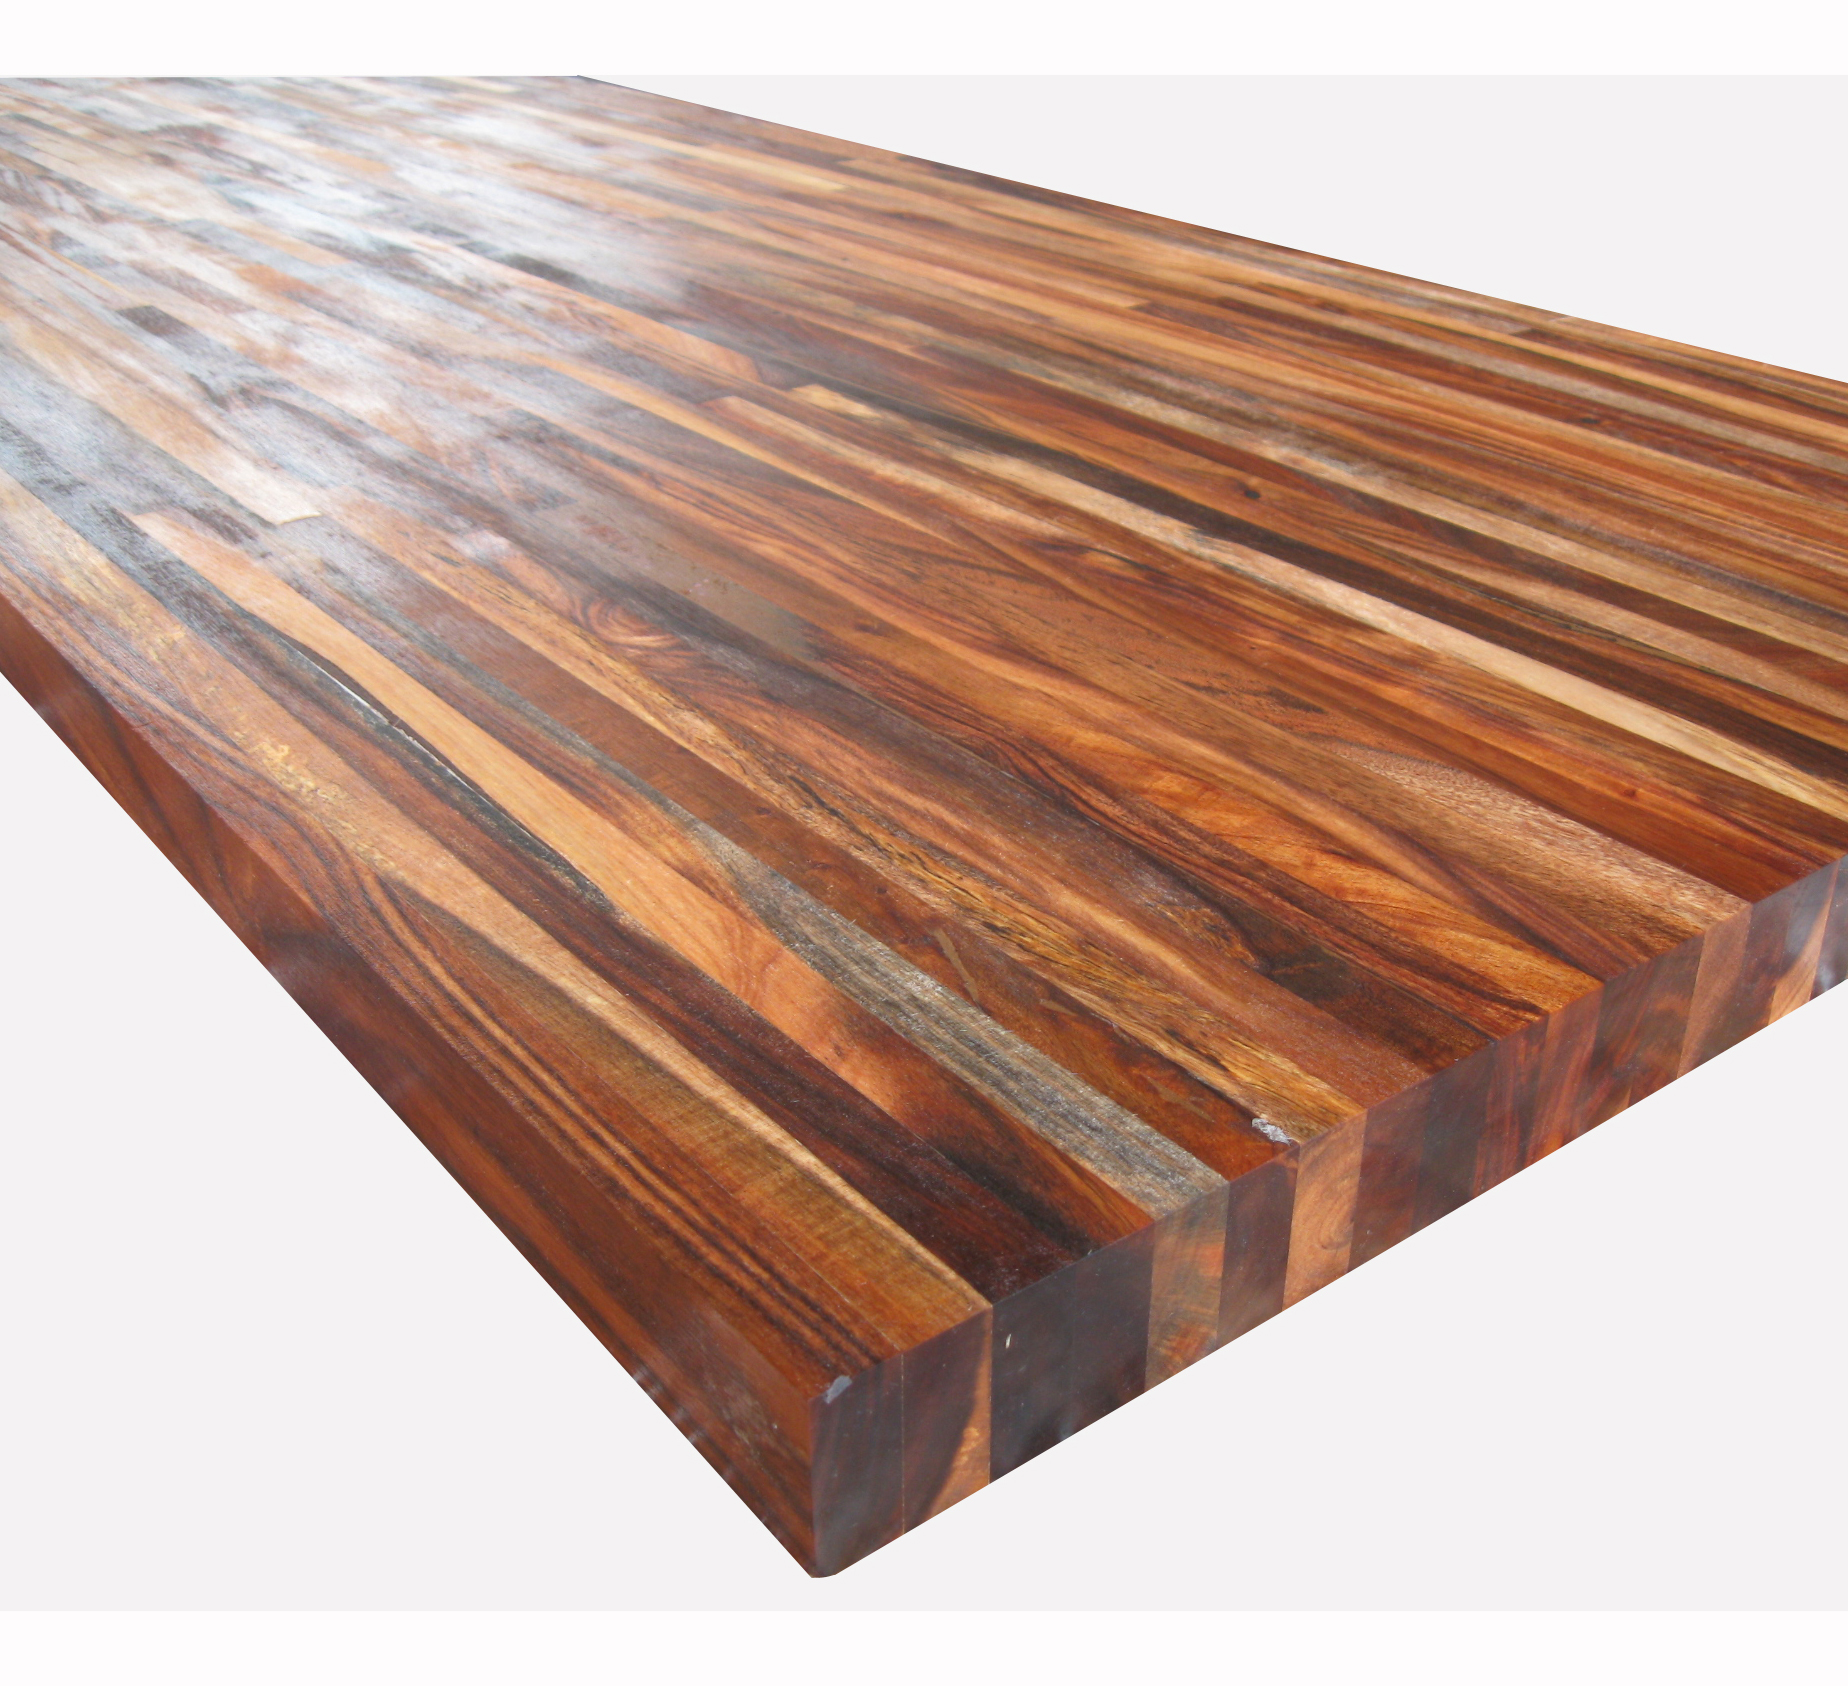 asian walnut wooden coffee table 100 fsc certified buy raw wood table pure wood tables wooden table product on alibaba com